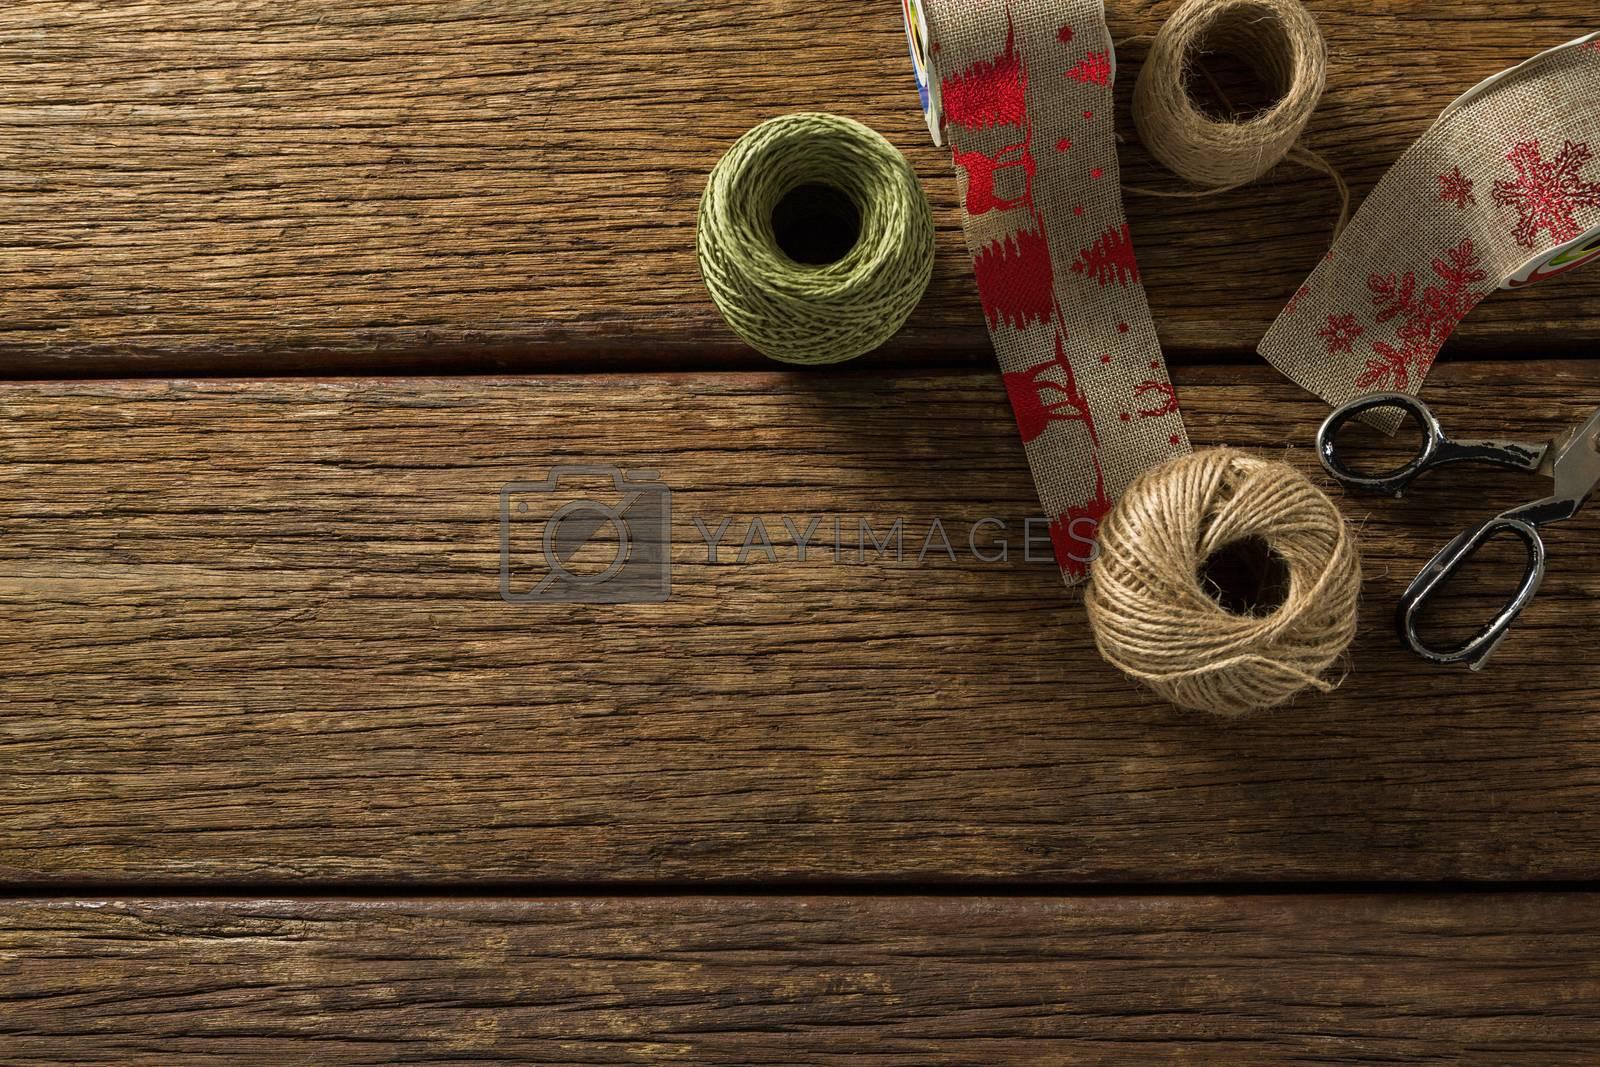 Thread and jute spools with scissor by Wavebreakmedia